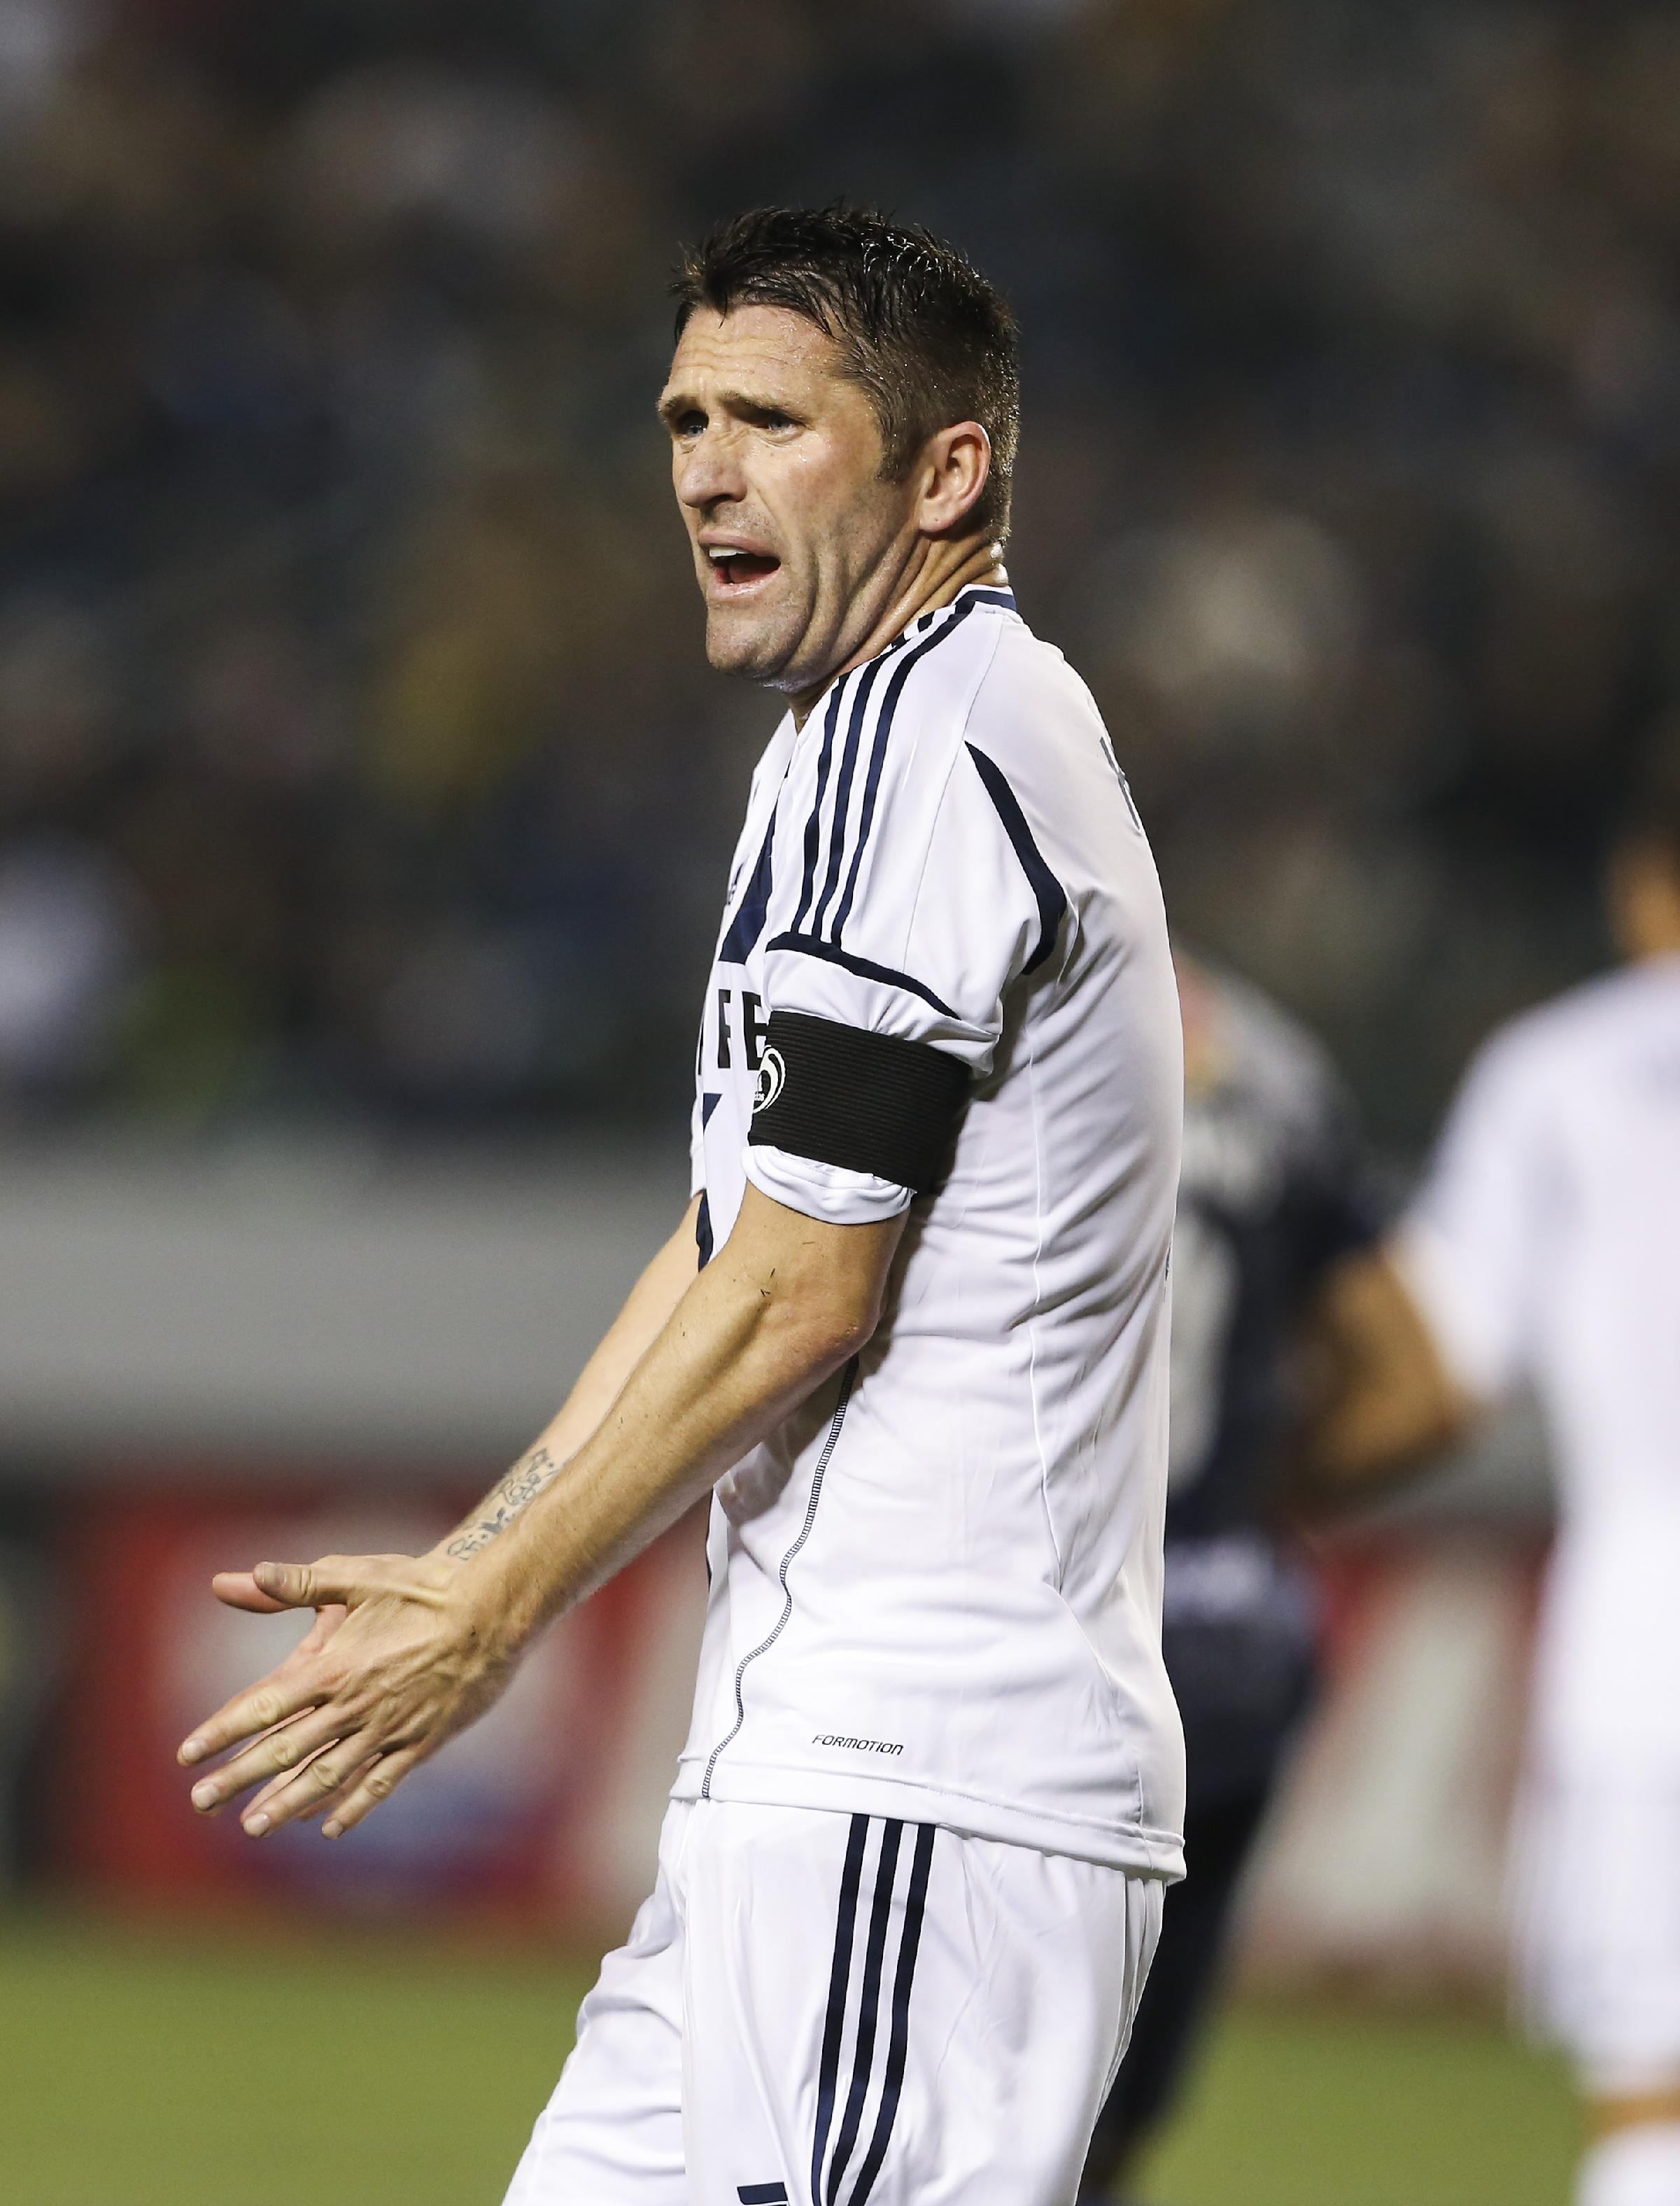 Keane converts 2 penalty kicks as Galaxy beat Crew